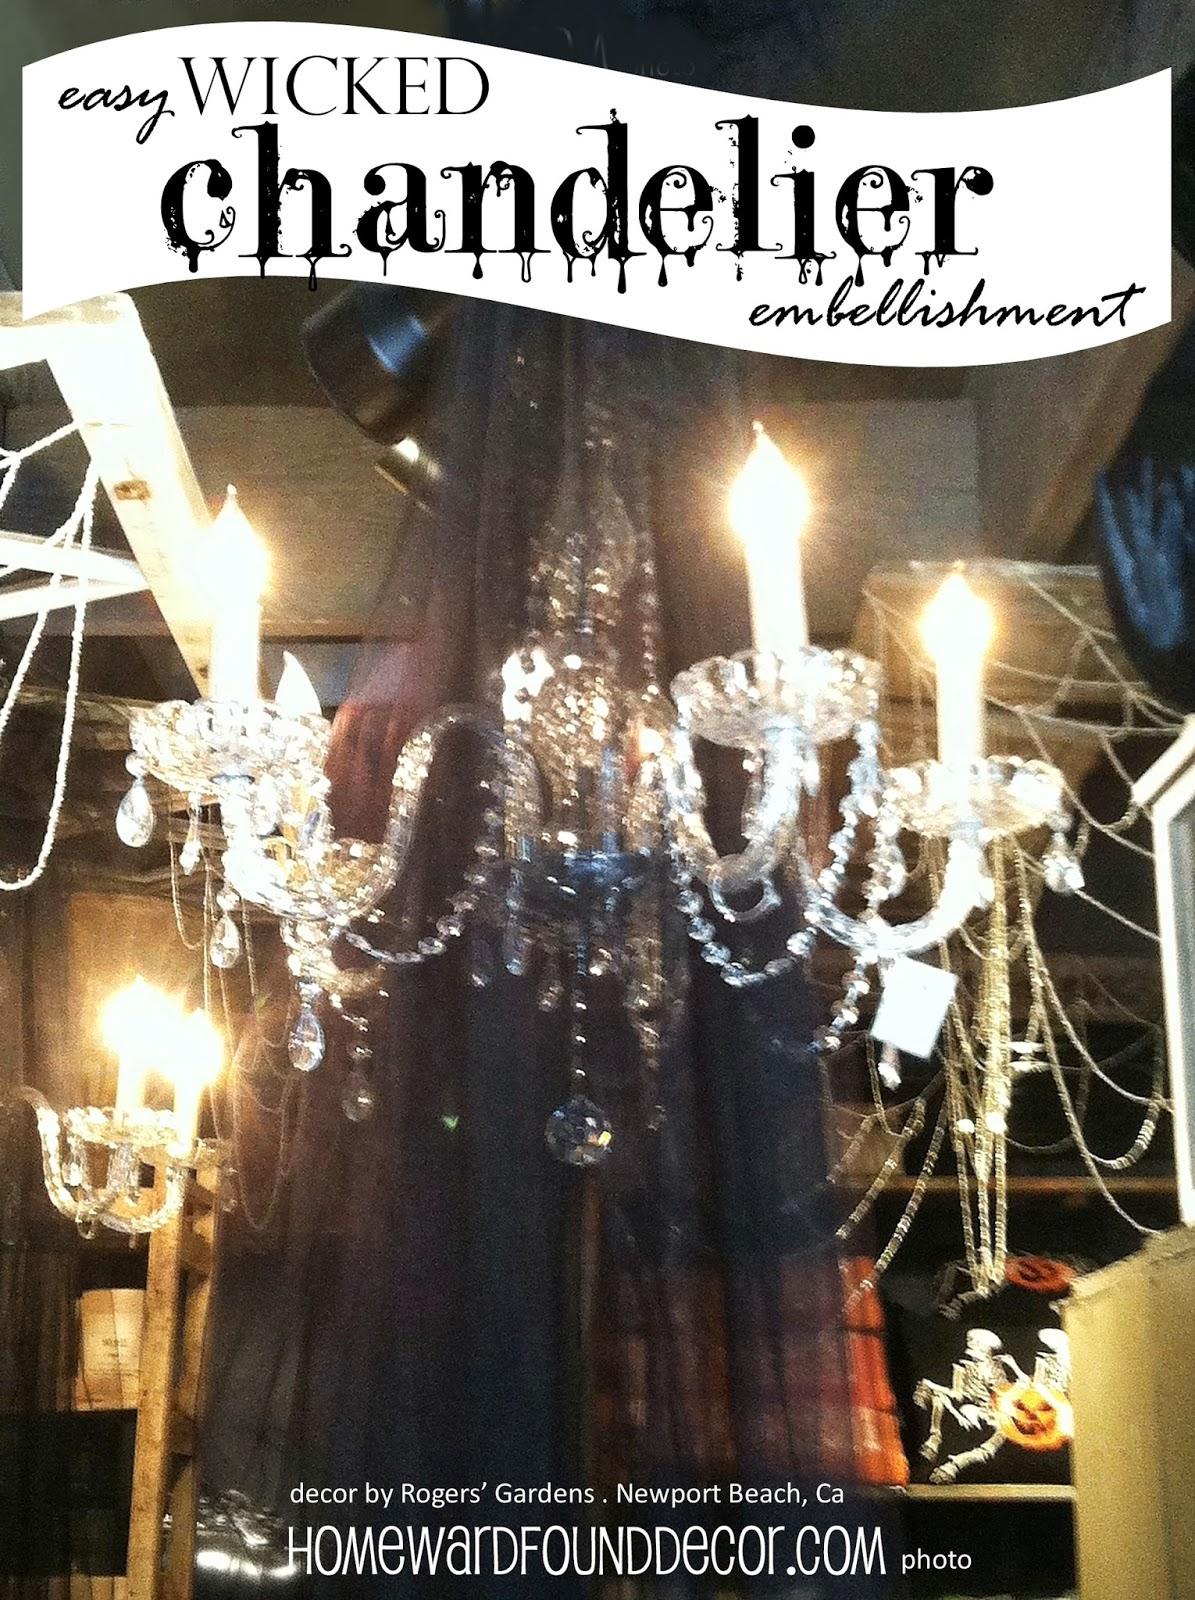 Wicked easy chandelierhomewardfounddecor wicked easy chandelier arubaitofo Gallery